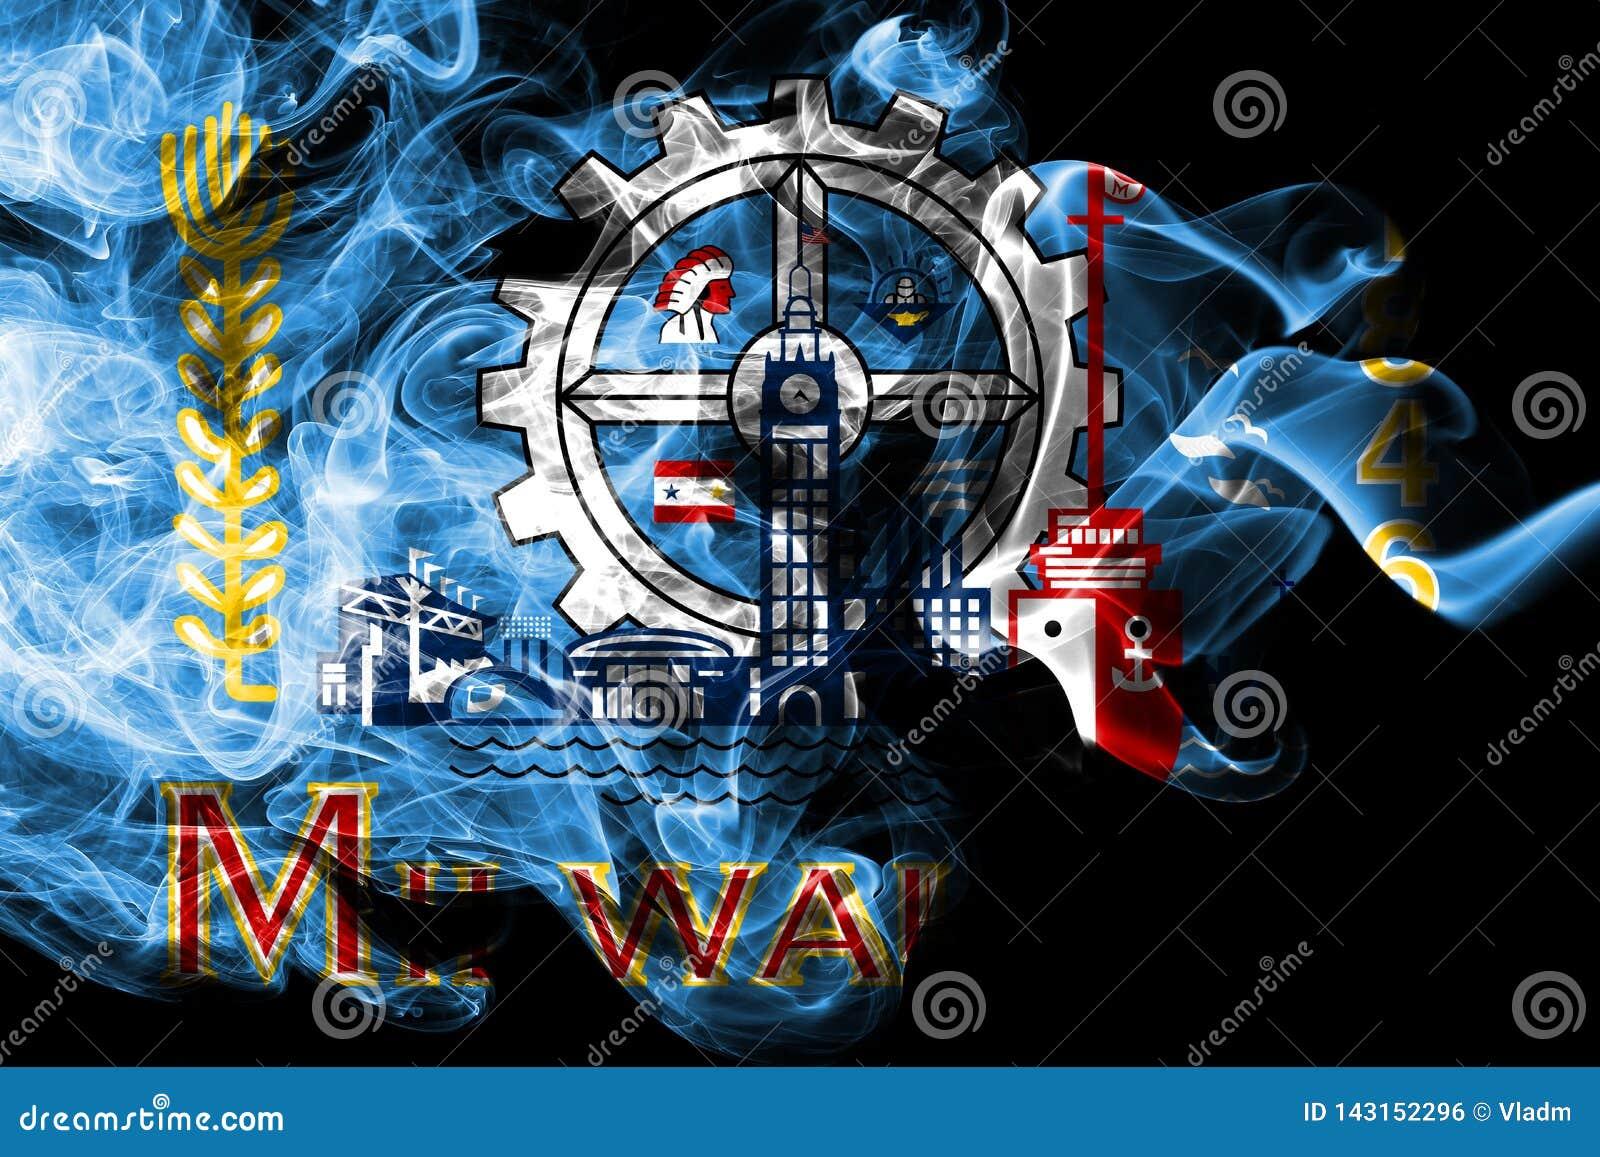 Milwaukee city smoke flag, Wisconsin State, United States Of America